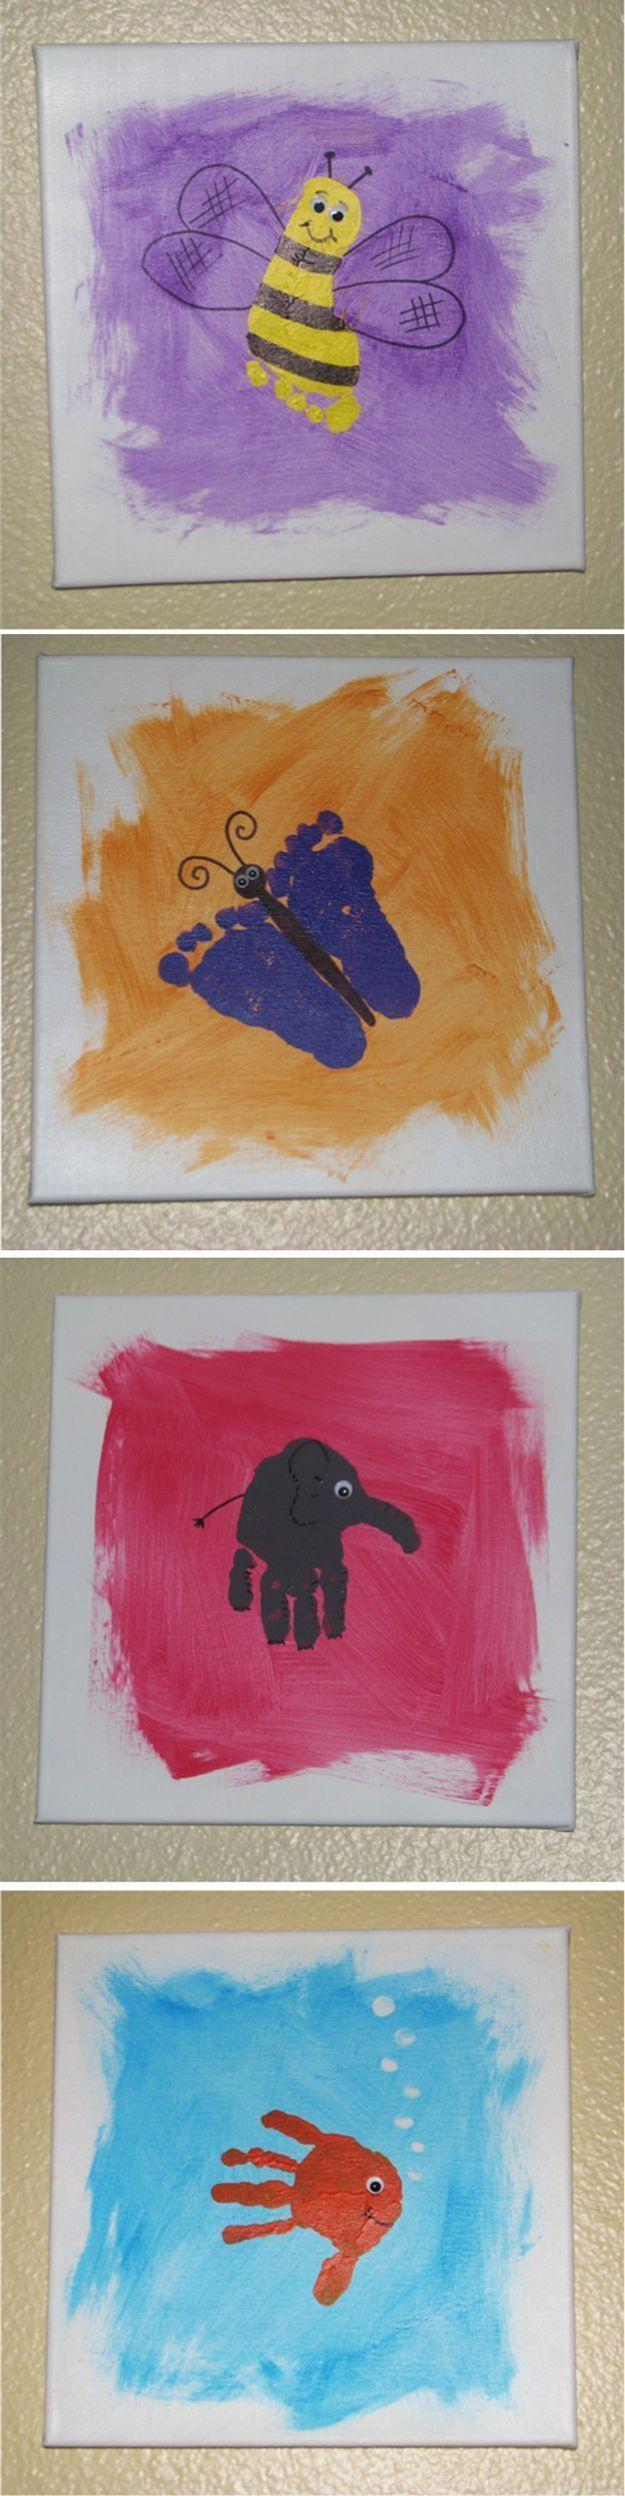 1000 ideas about footprint art on pinterest footprint for Cool diy art projects